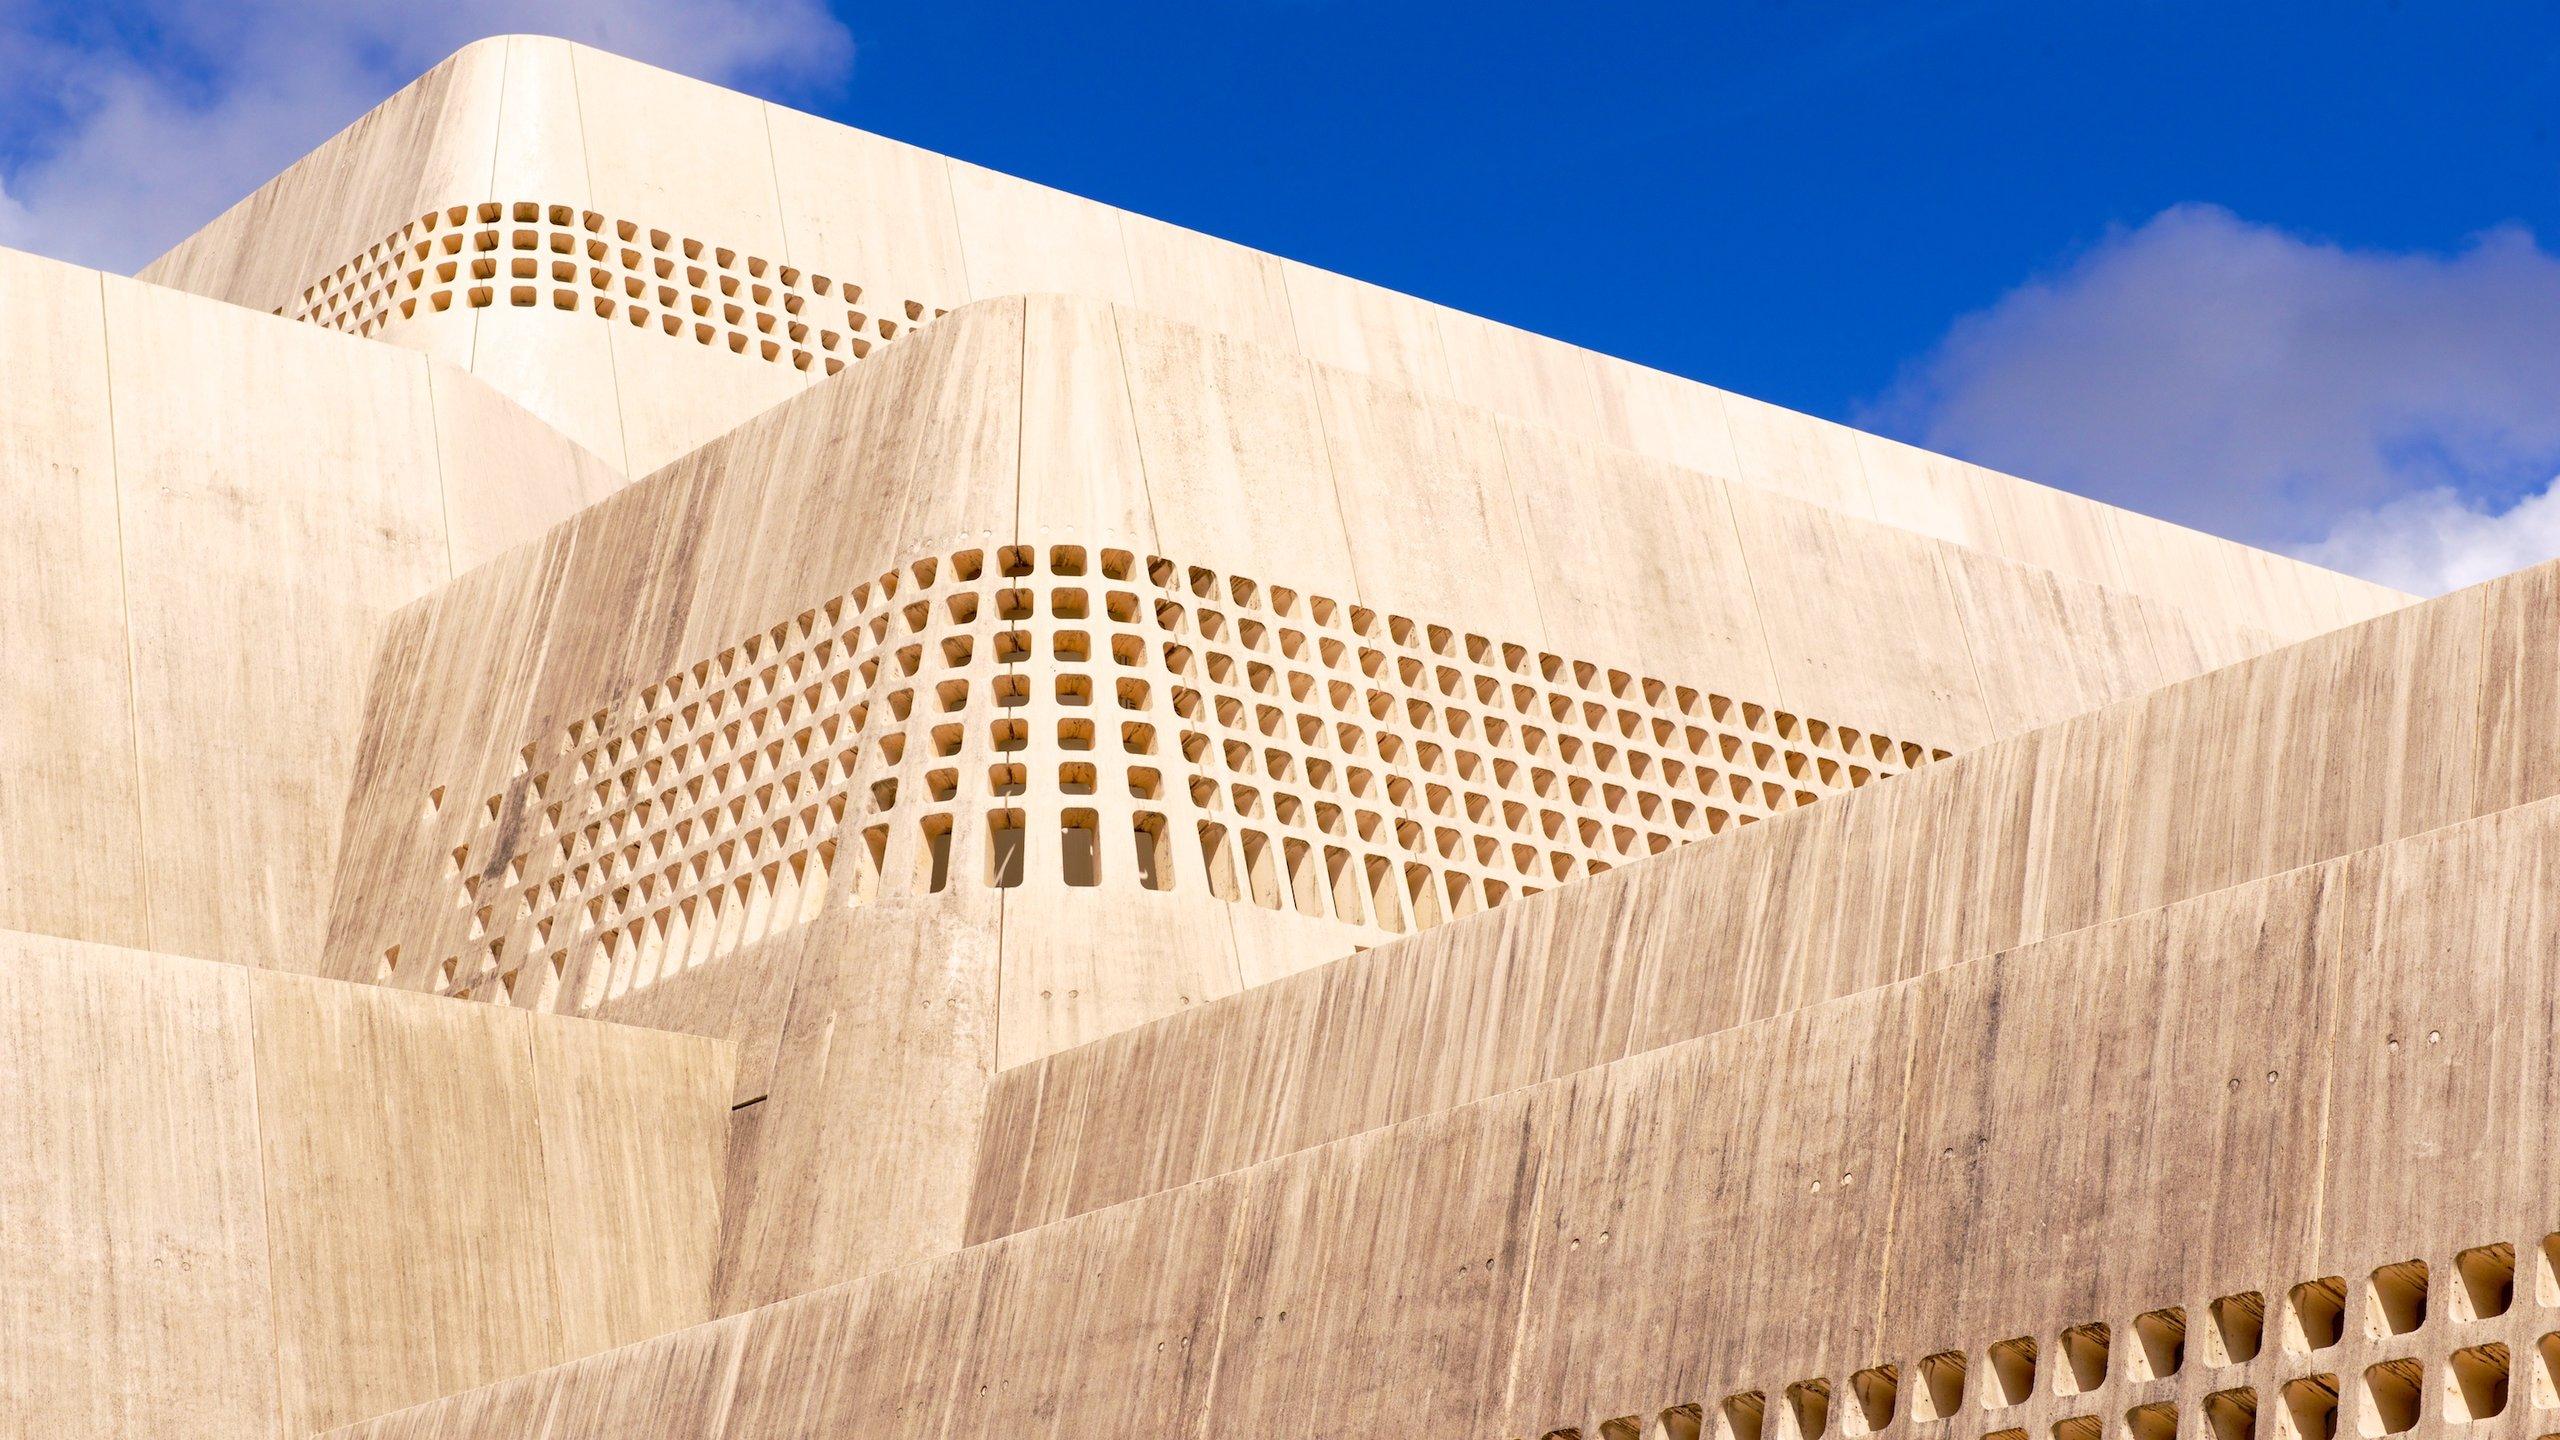 Okinawa Prefectural Museum and Art Museum, Naha, Okinawa Prefecture, Japan